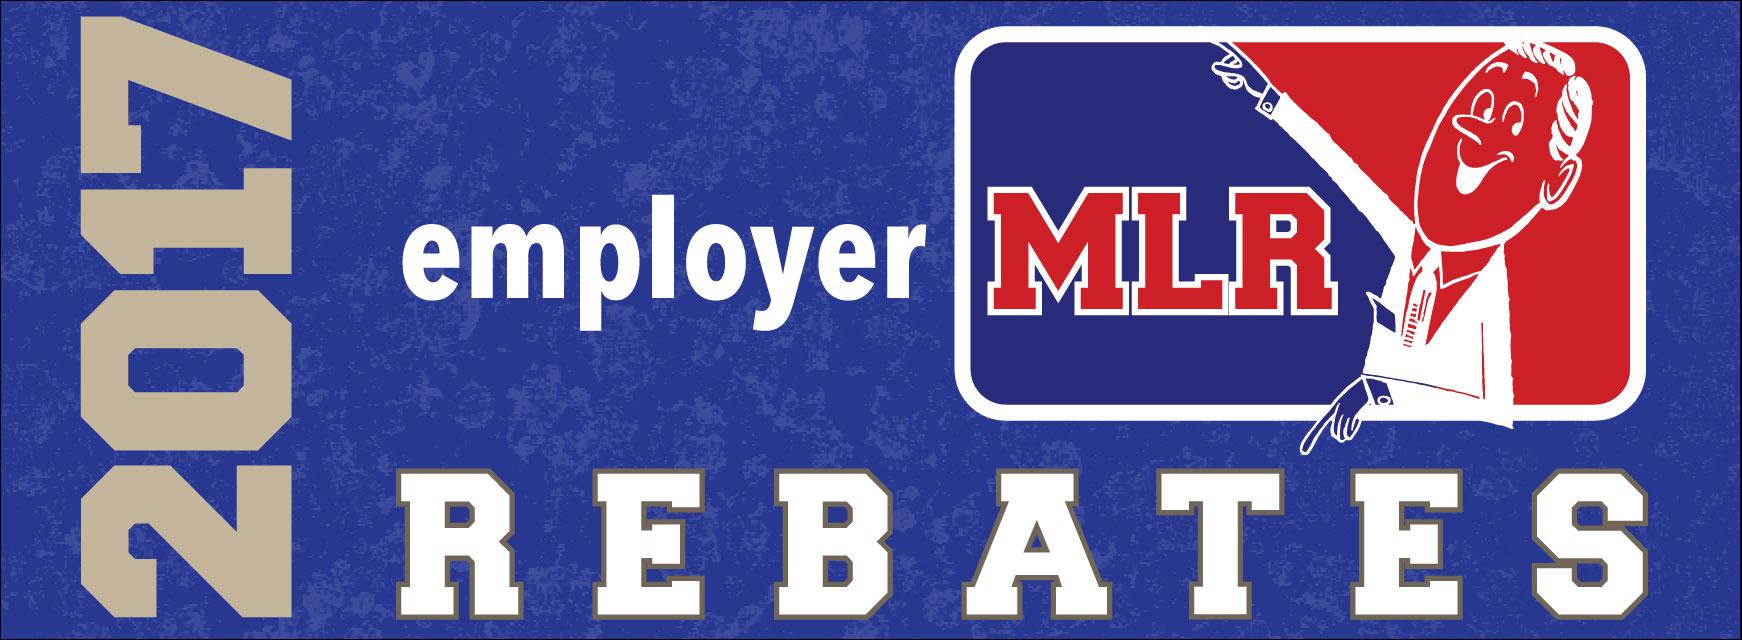 2017-employer-mlr-rebates